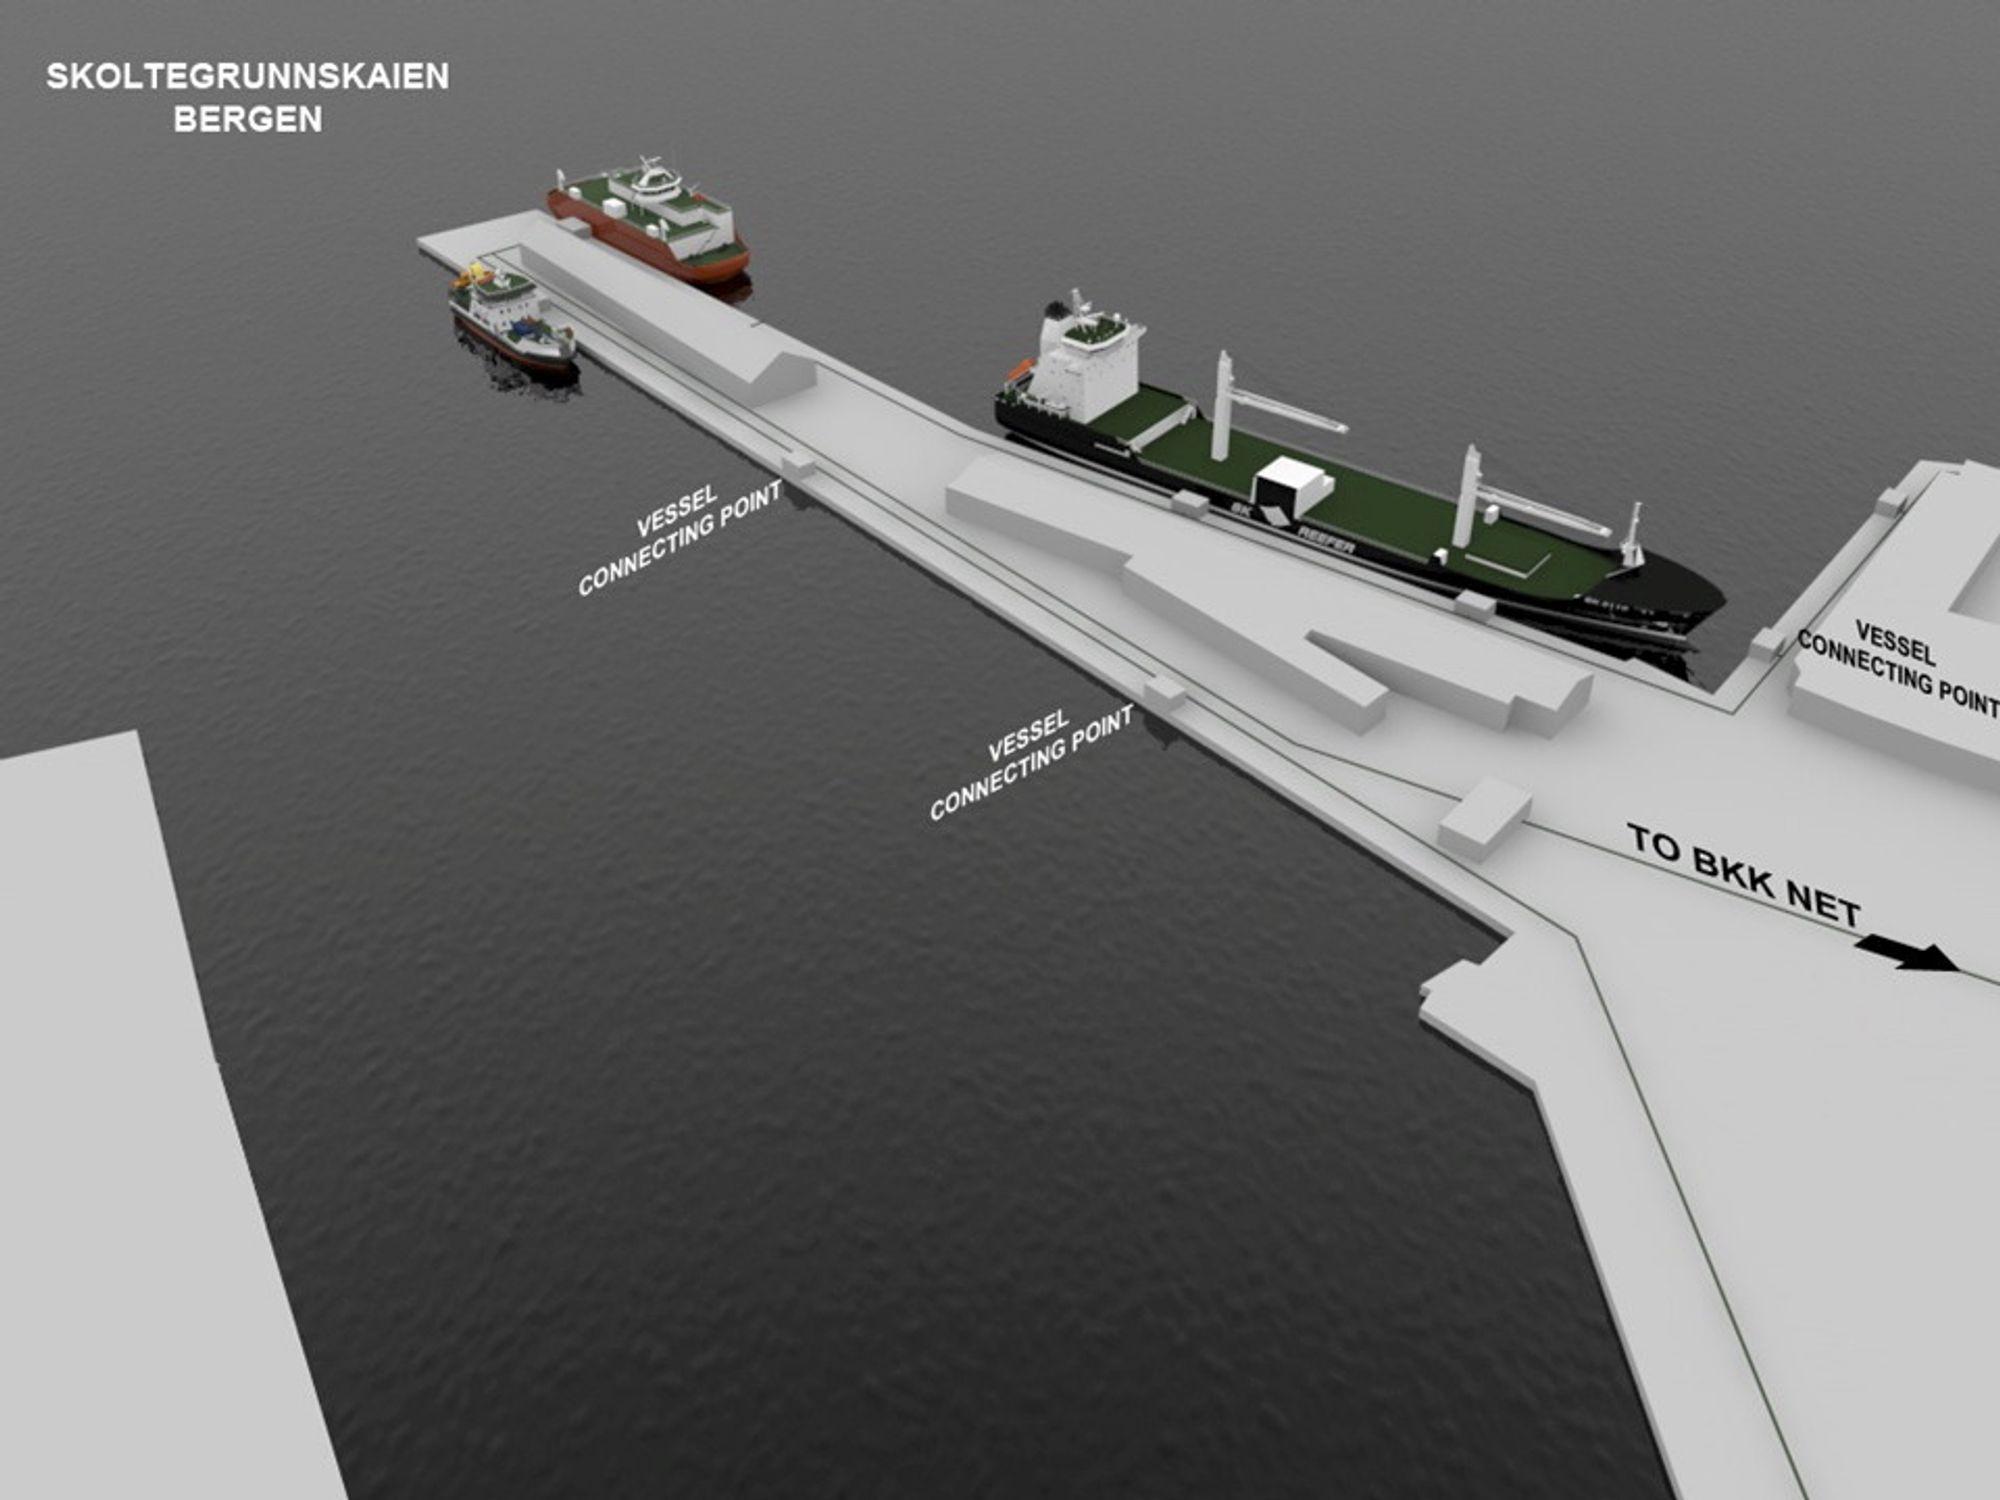 FLYTENDE STRØM: Hordaland Maritime Miljøselskap skal  utrede et flytende el-kraftverk for Bergen havn. Miljøvennlig kraft skal gi Nox- og SOx-fri strøm til andre skip.